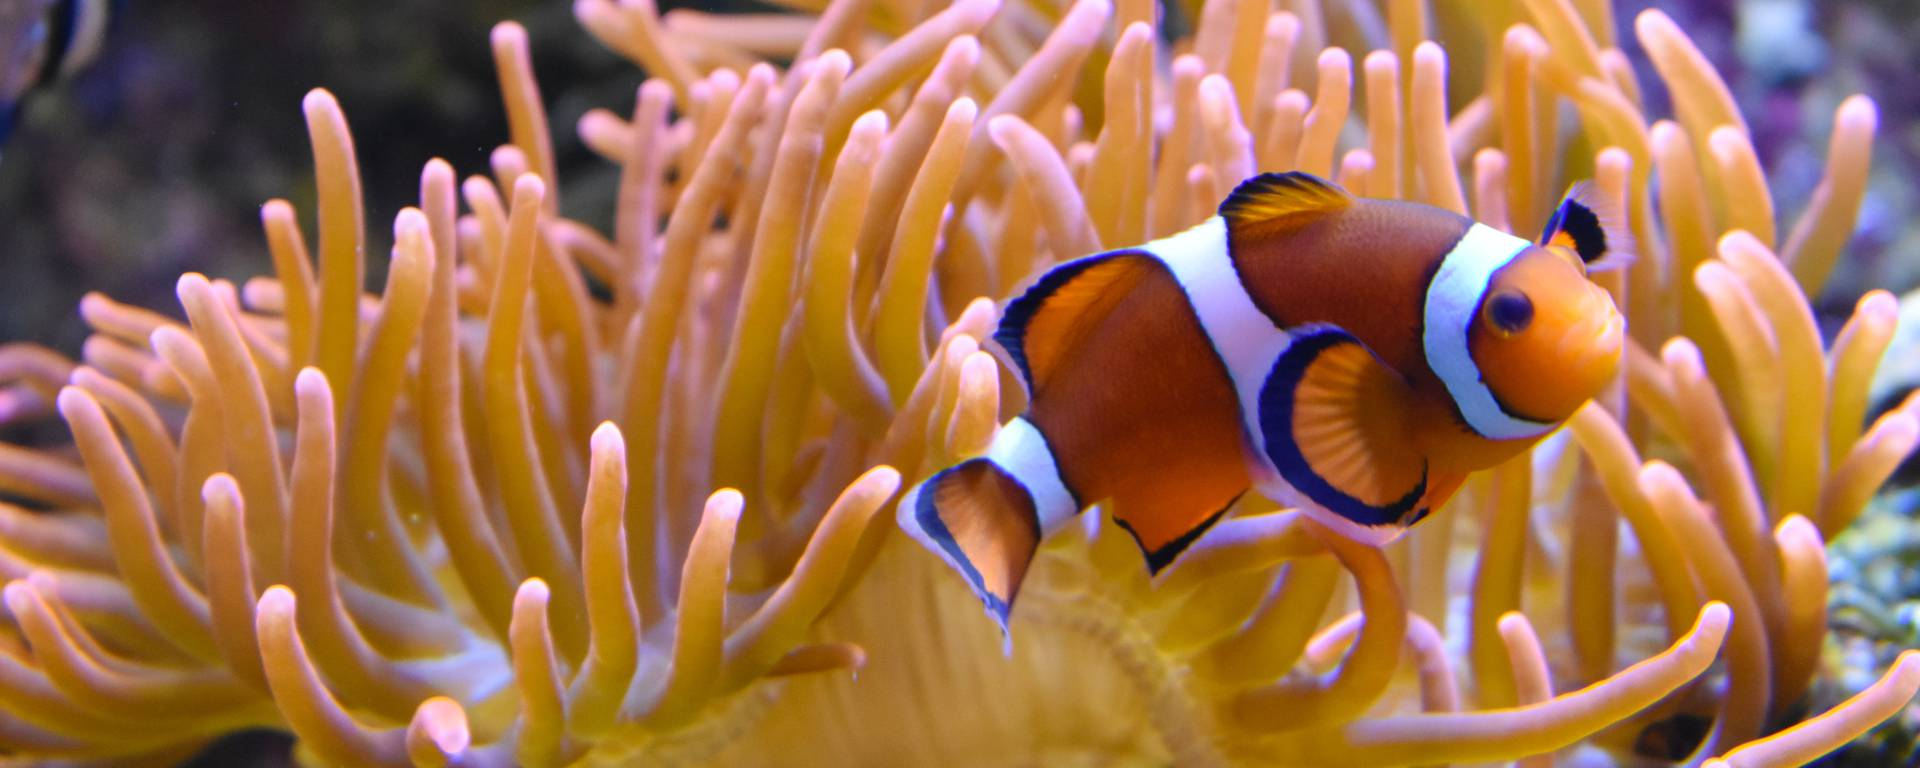 anemone_©Louise Merlier